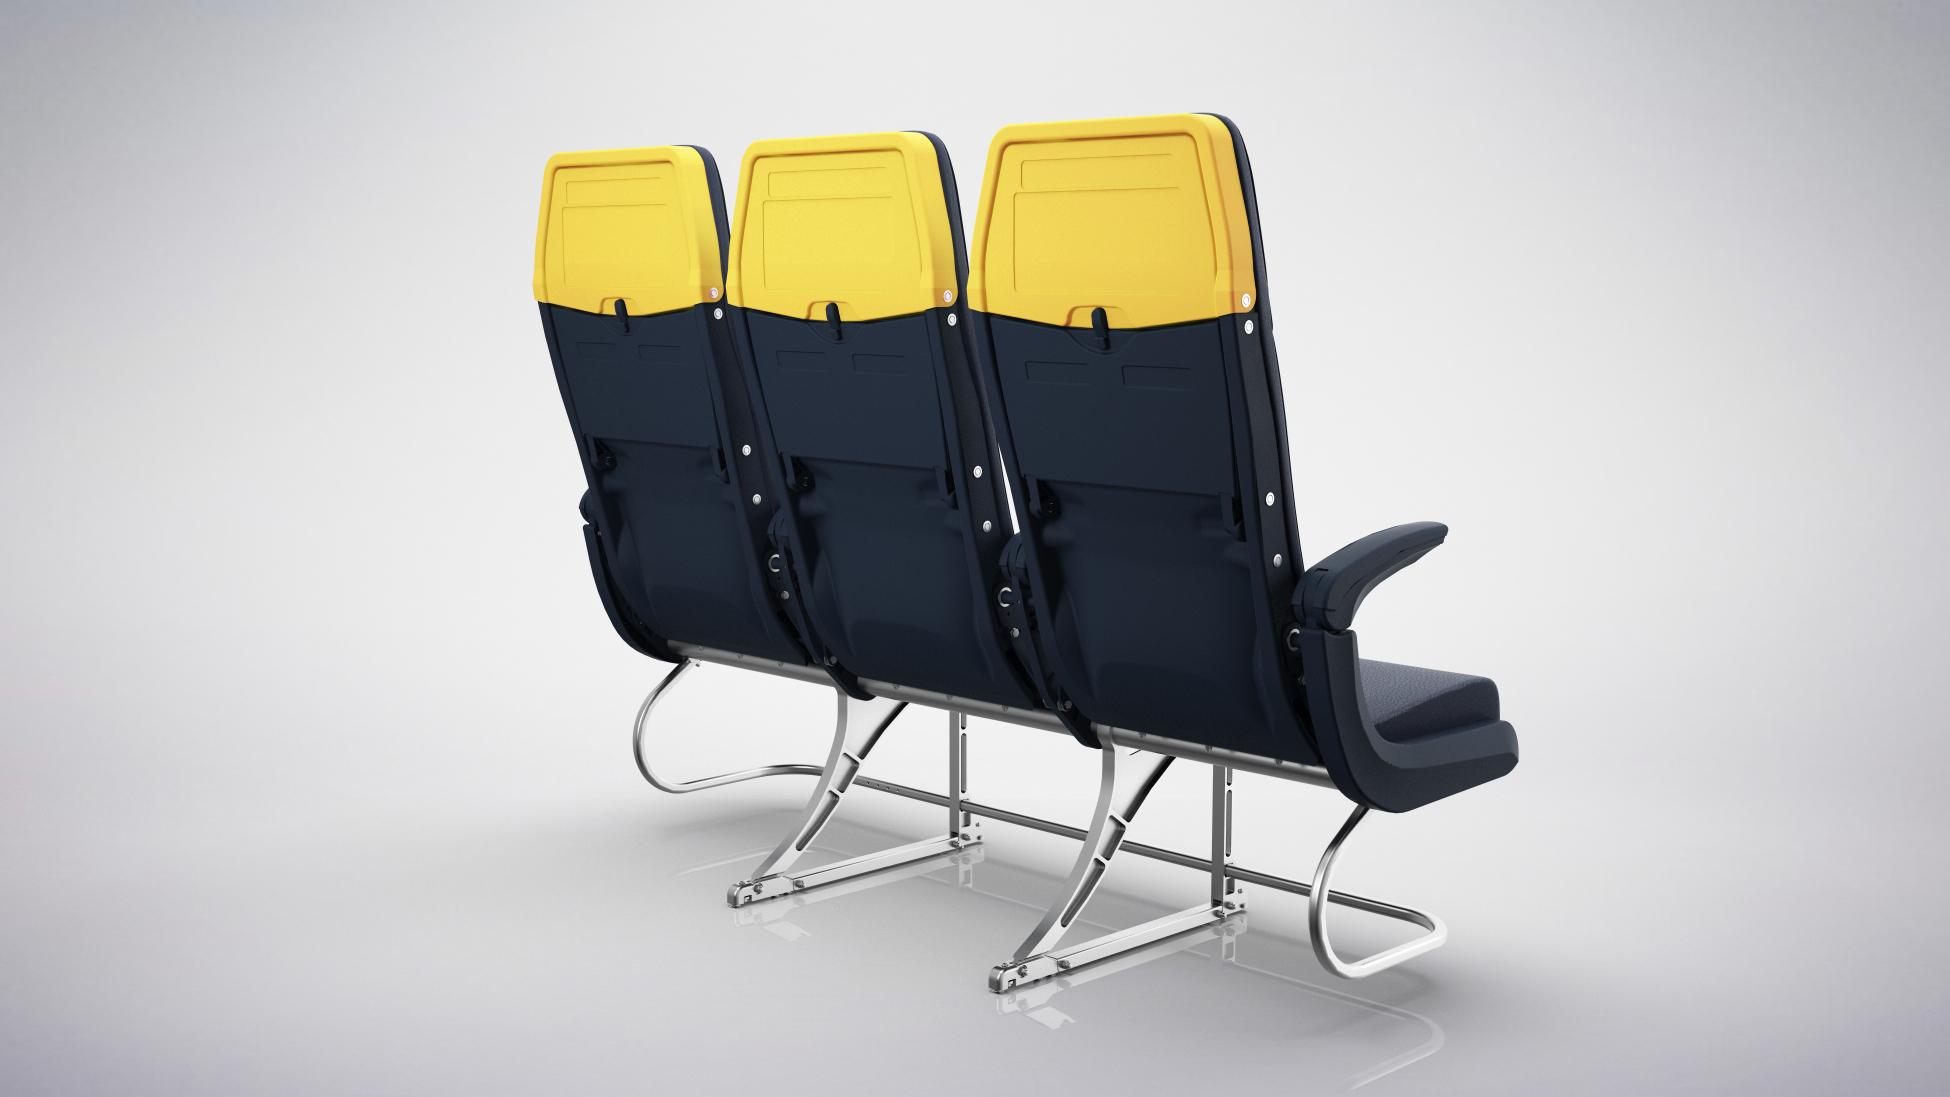 Zodiac Slimline-flysæder (Foto: Ryanair)